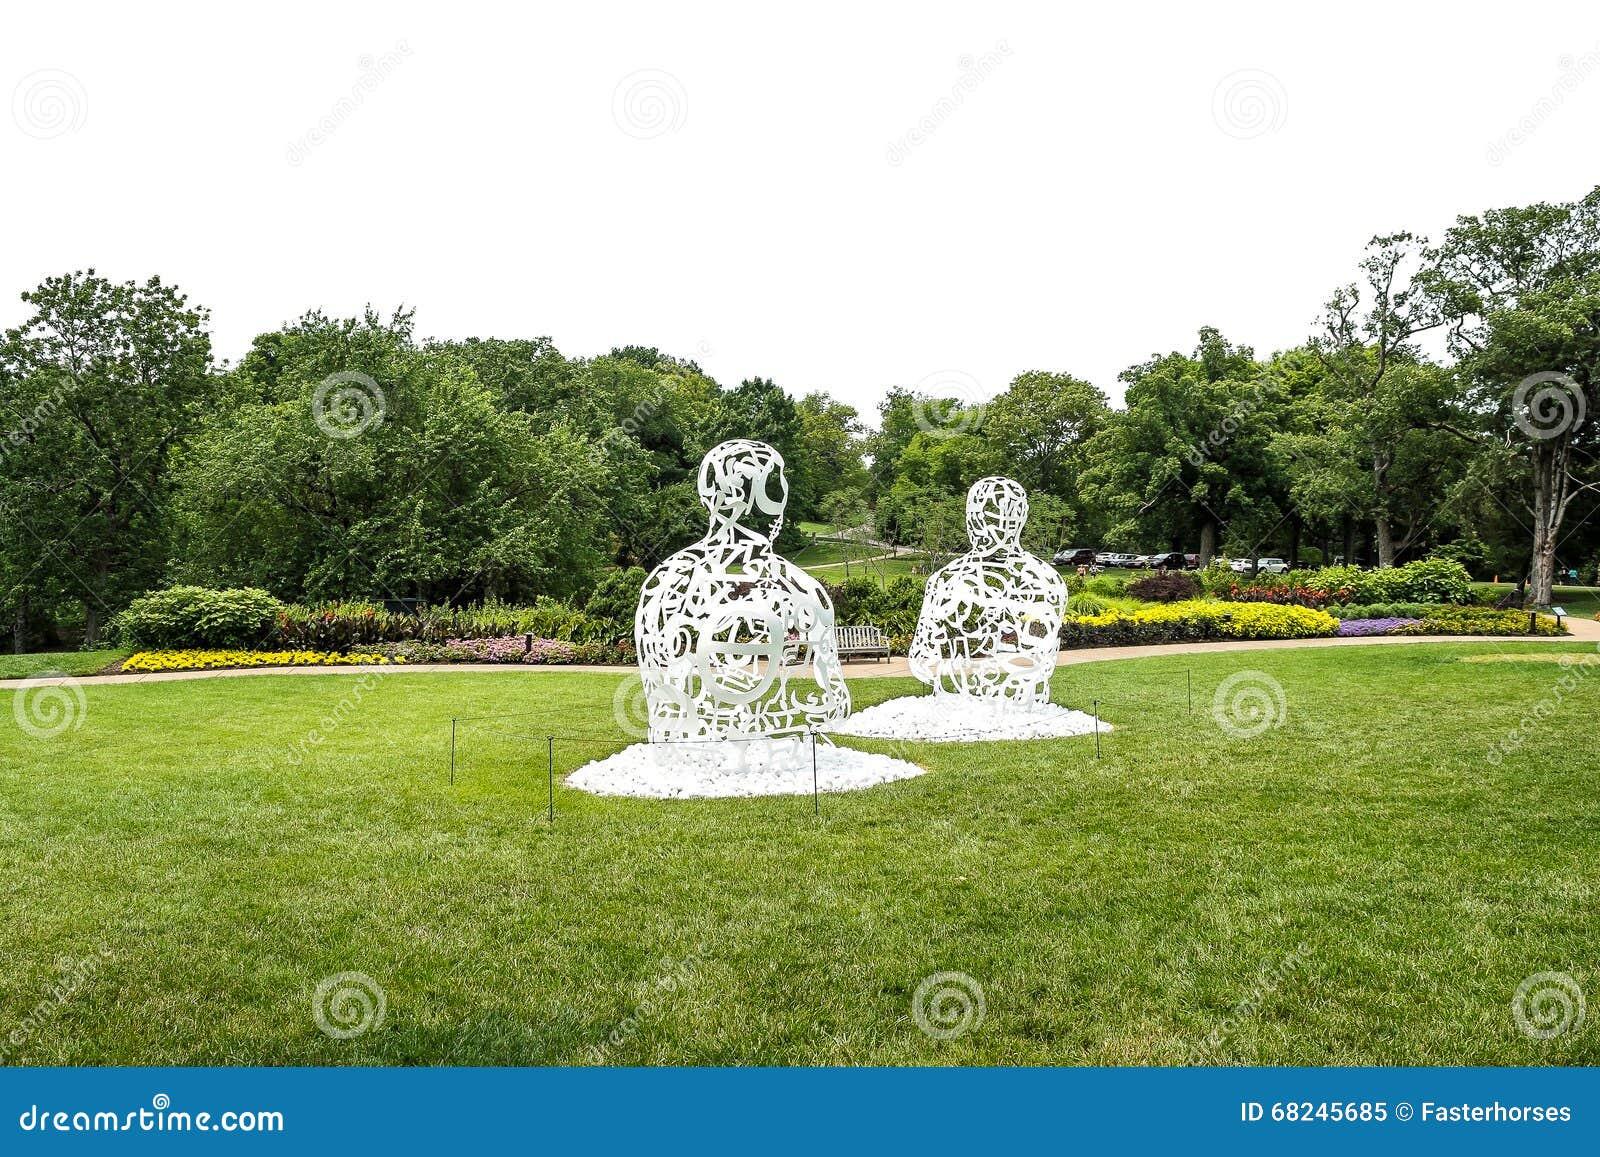 Metallskulpturen redaktionelles bild bild von metall for Metallskulpturen garten